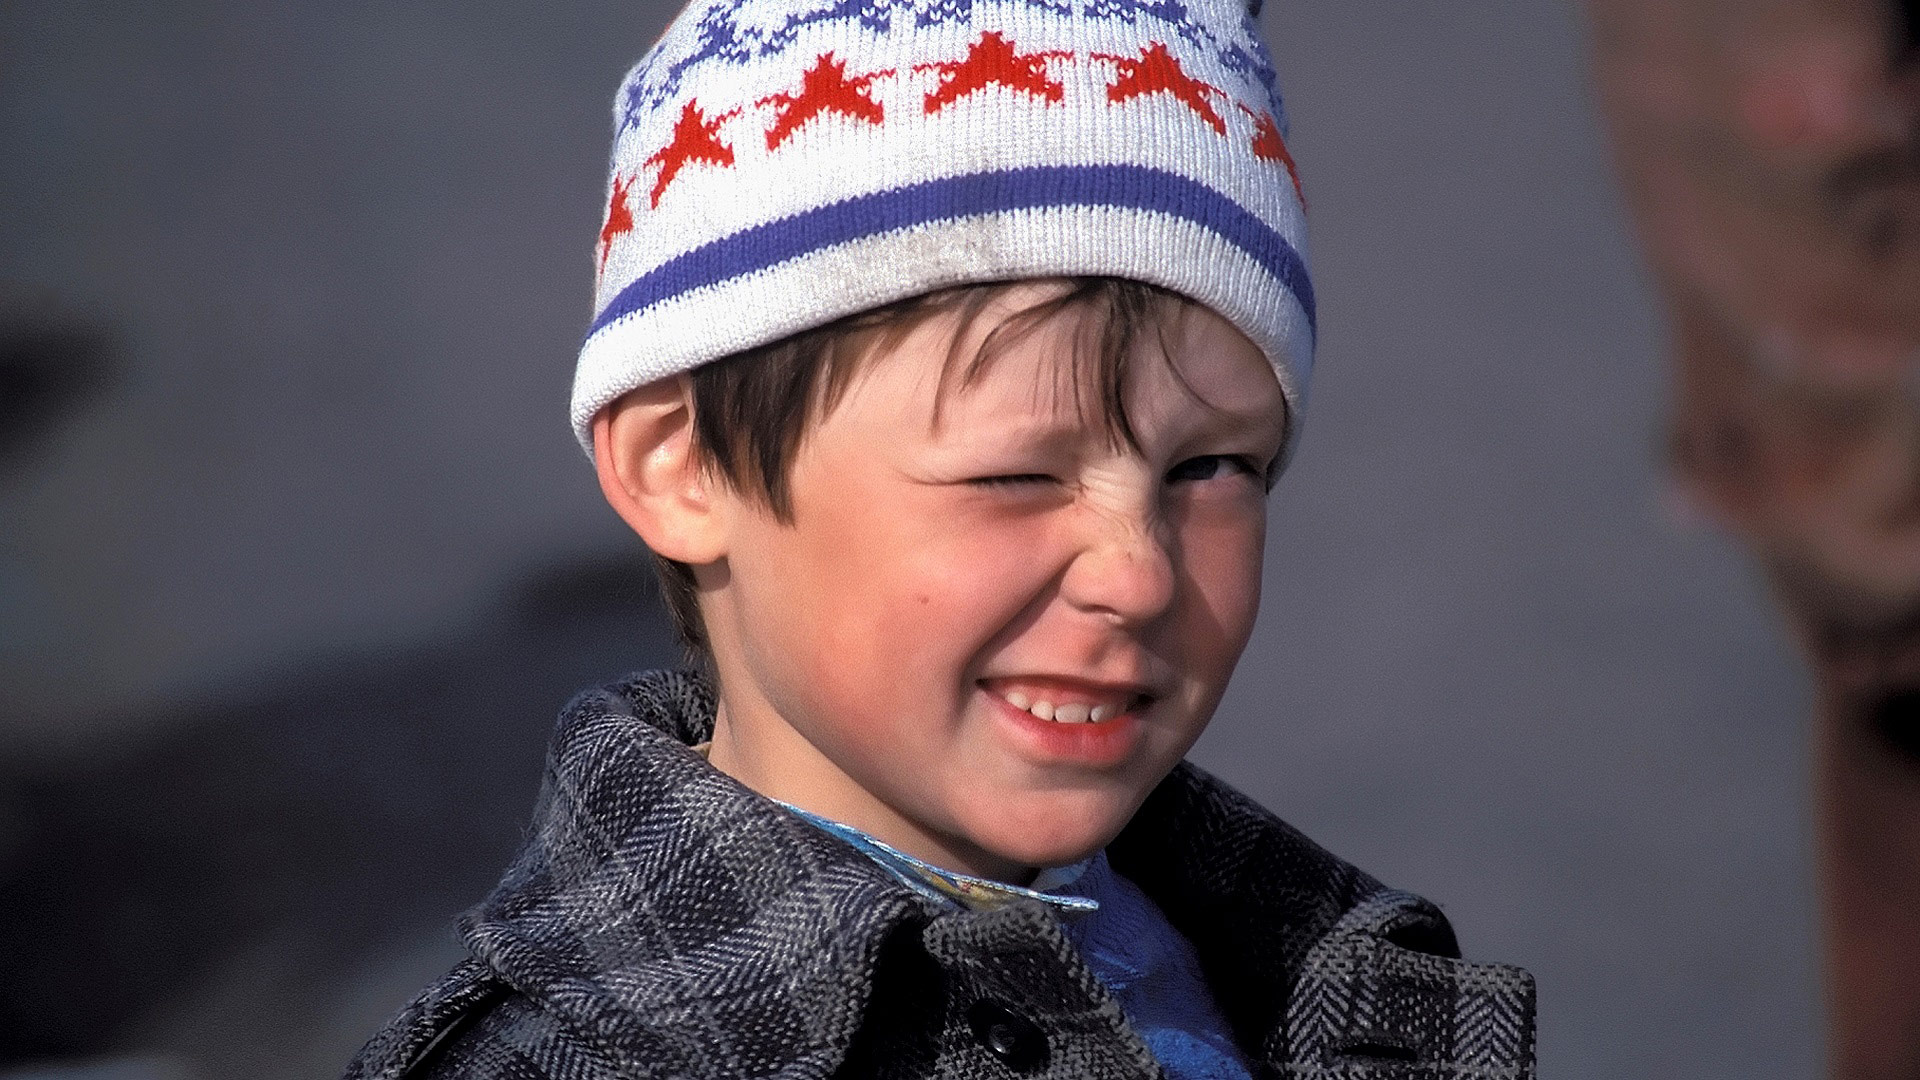 Young boy near Baikal, Irkutsk Oblast, Russia with GeoEx